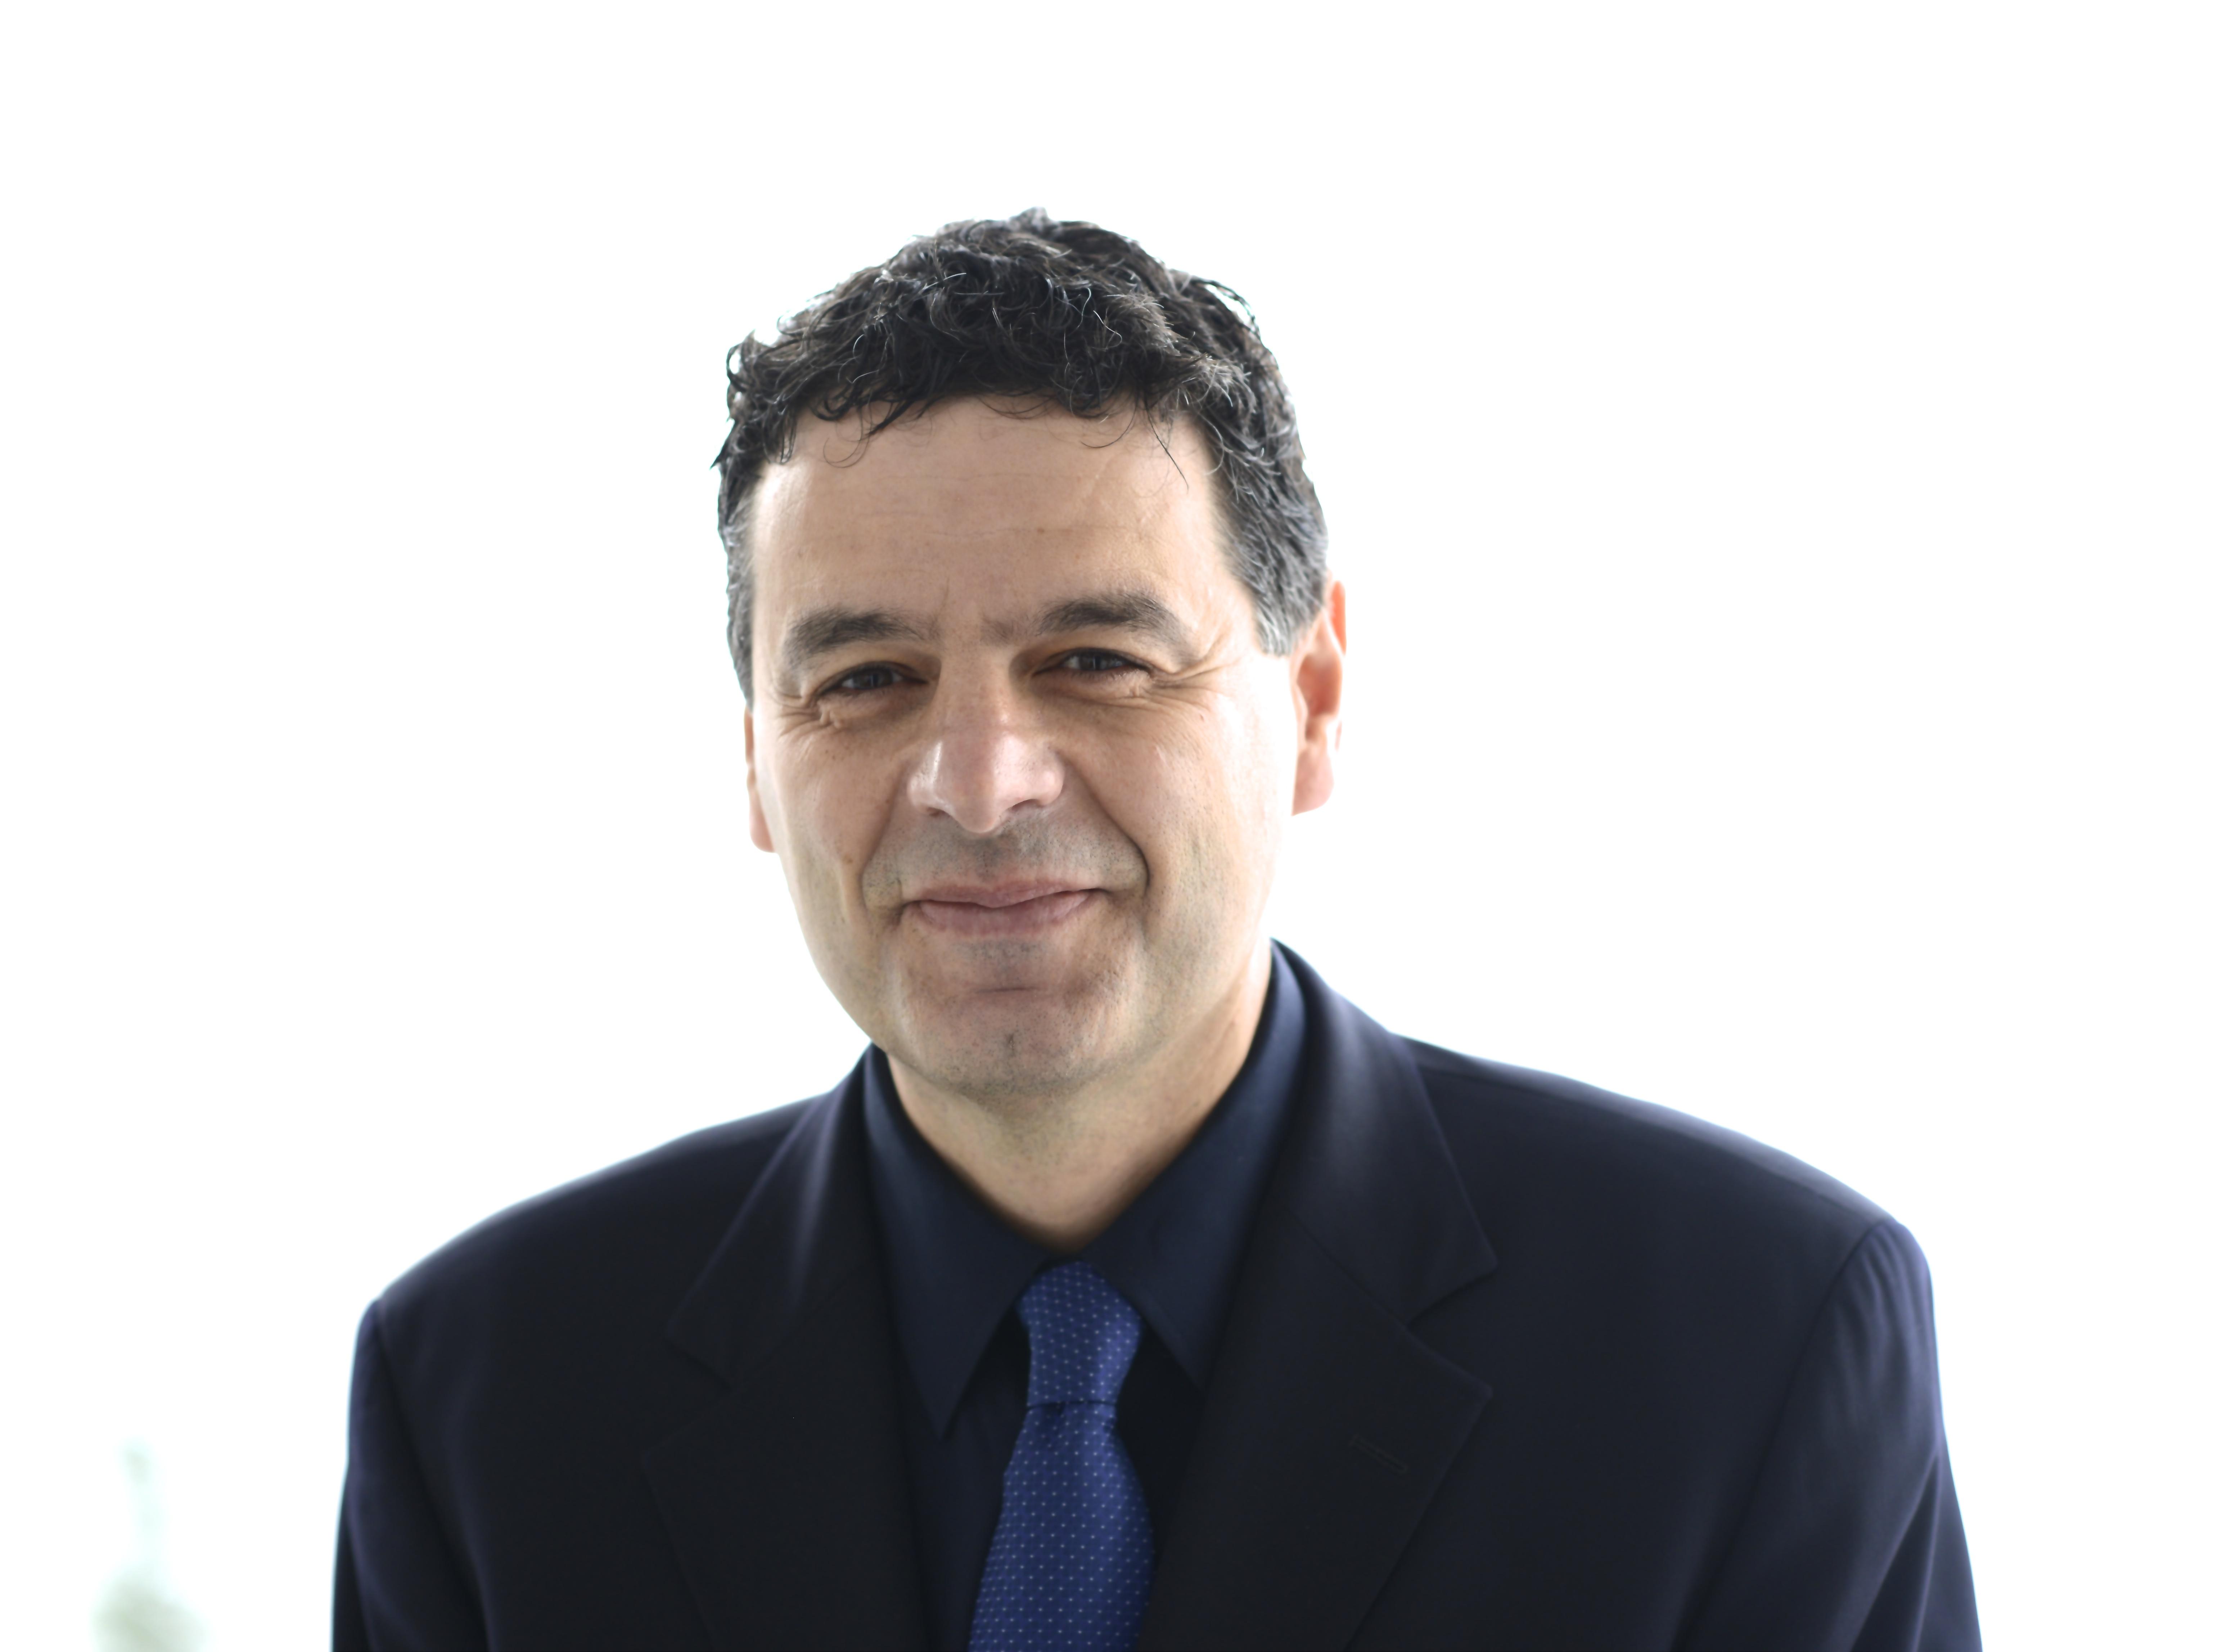 Public Talk at PASC14 Conference by Petros Koumoutsakos